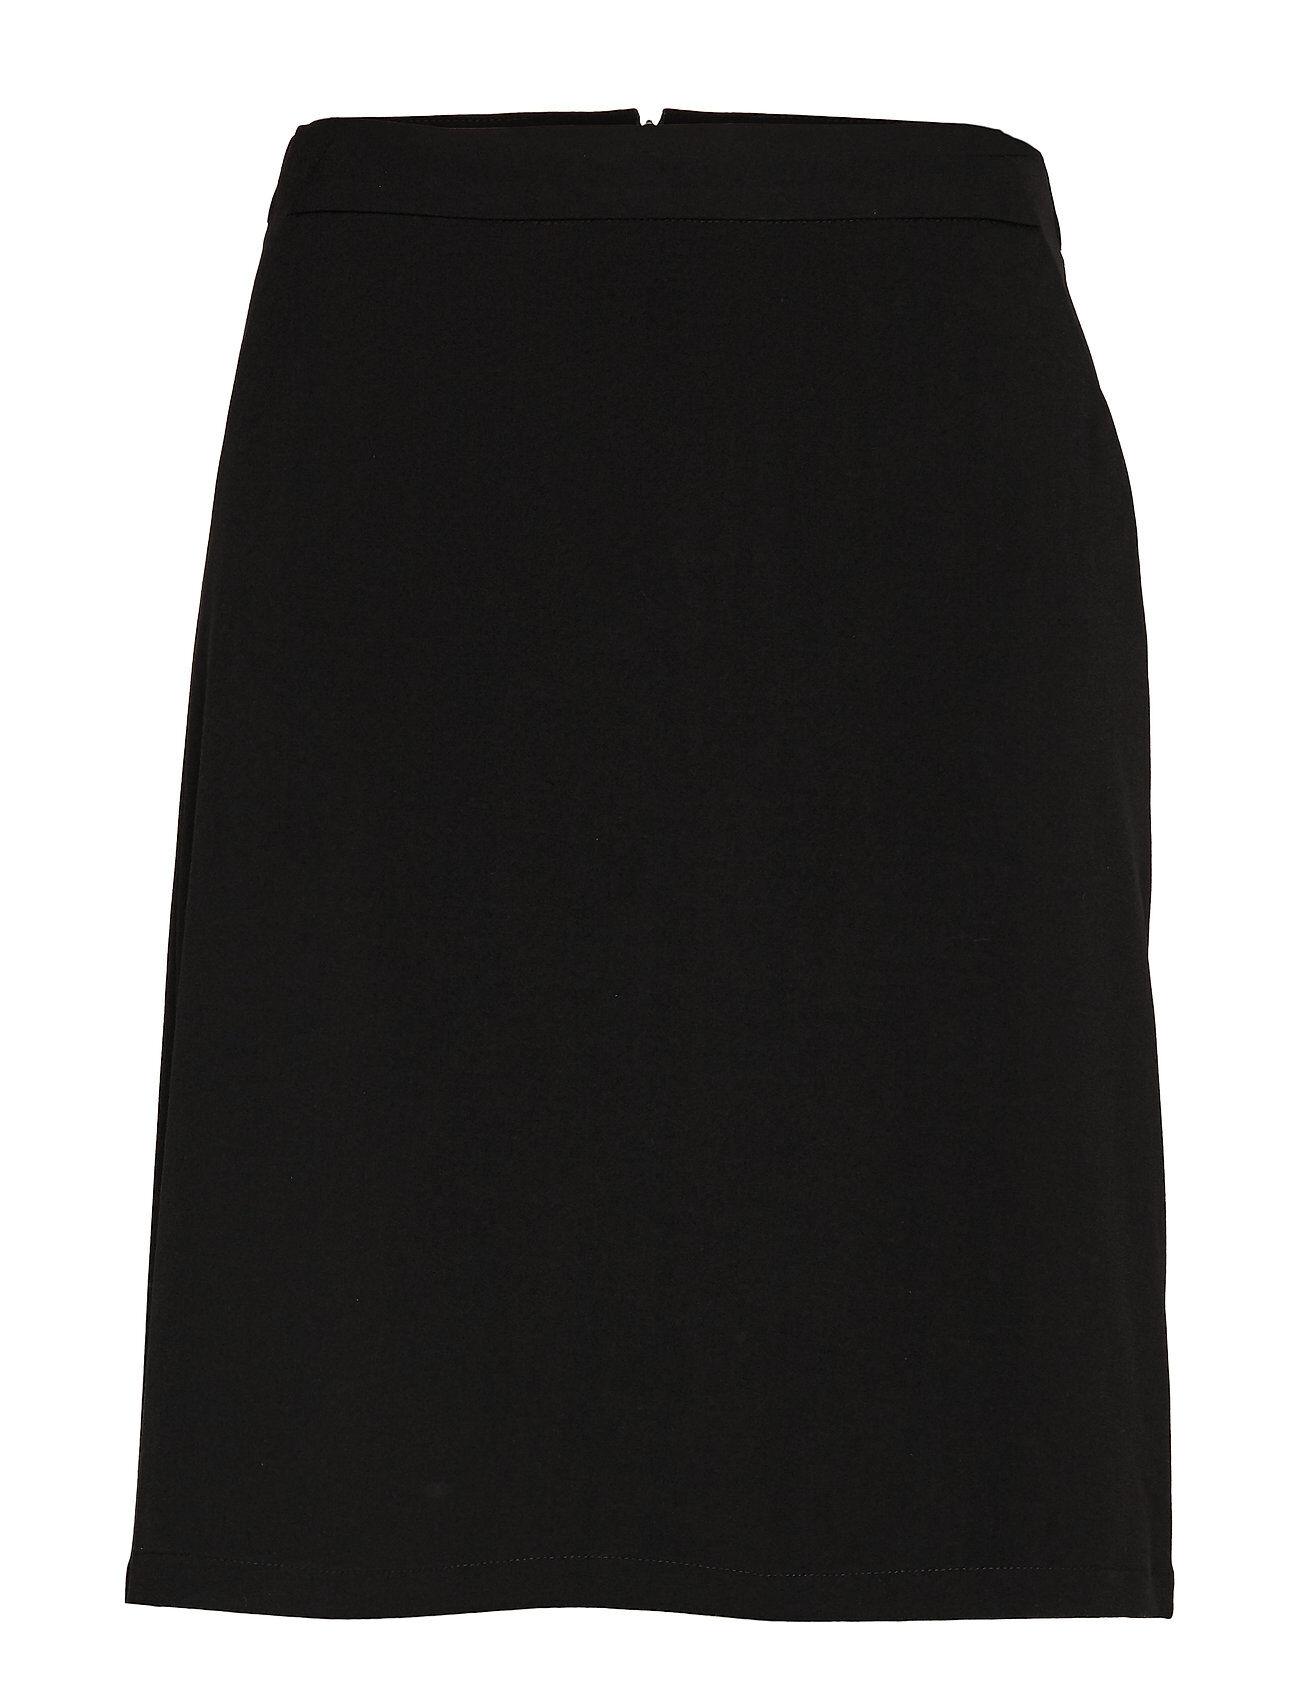 Culture Cuariane Skirt Polvipituinen Hame Musta Culture